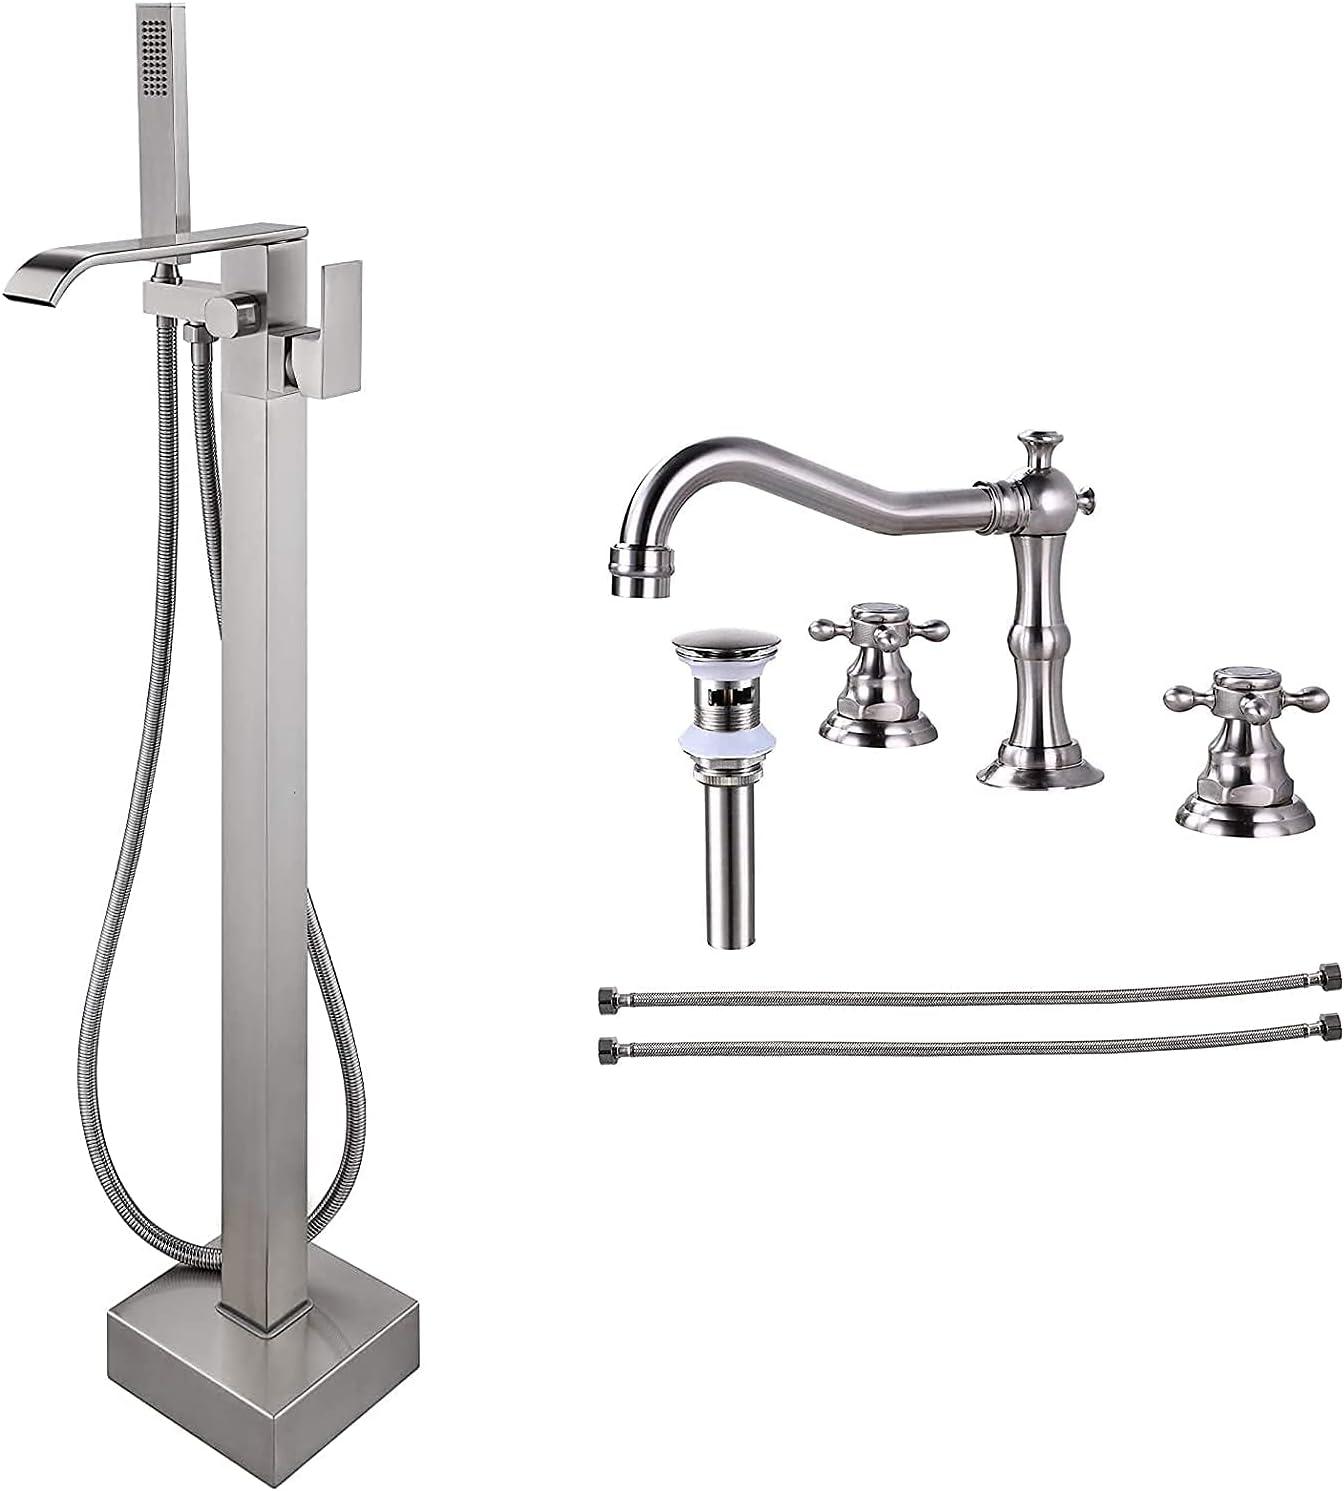 Max 77% OFF Waterfall Freestanding Bathtub Max 54% OFF Faucet Floor Handle Mount Single